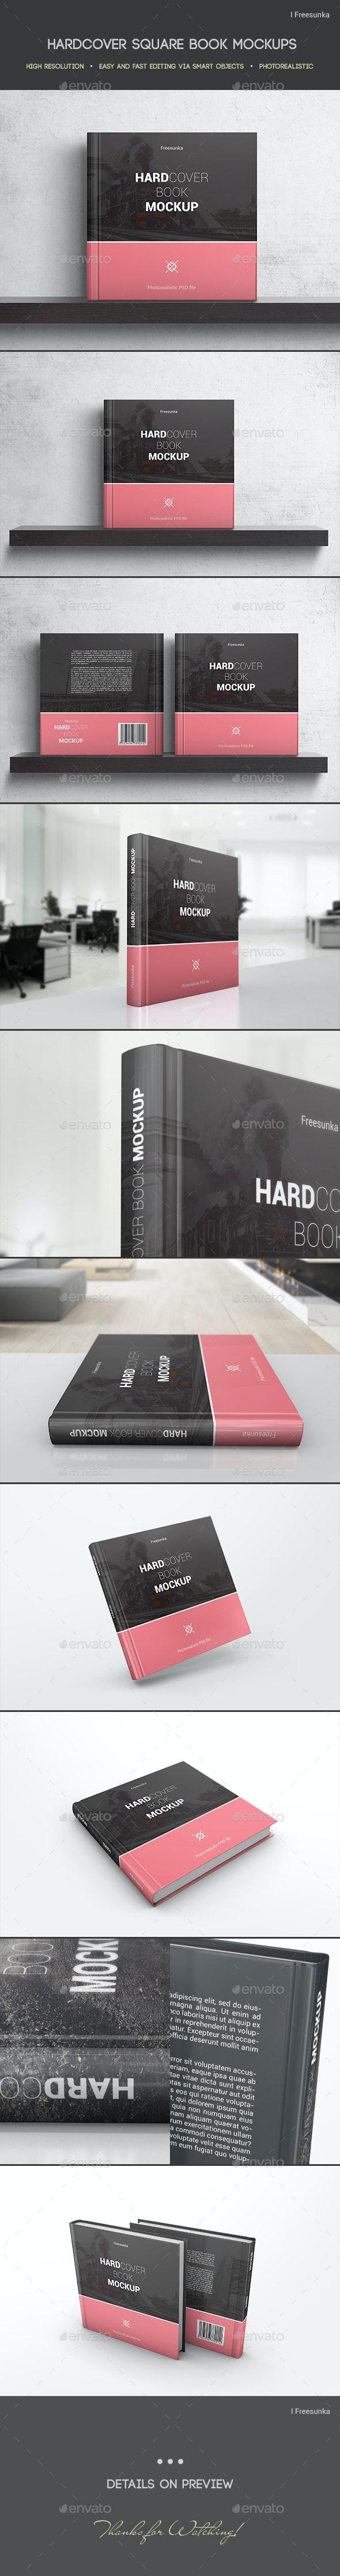 Hardcover Square Book Mockups - Books Print